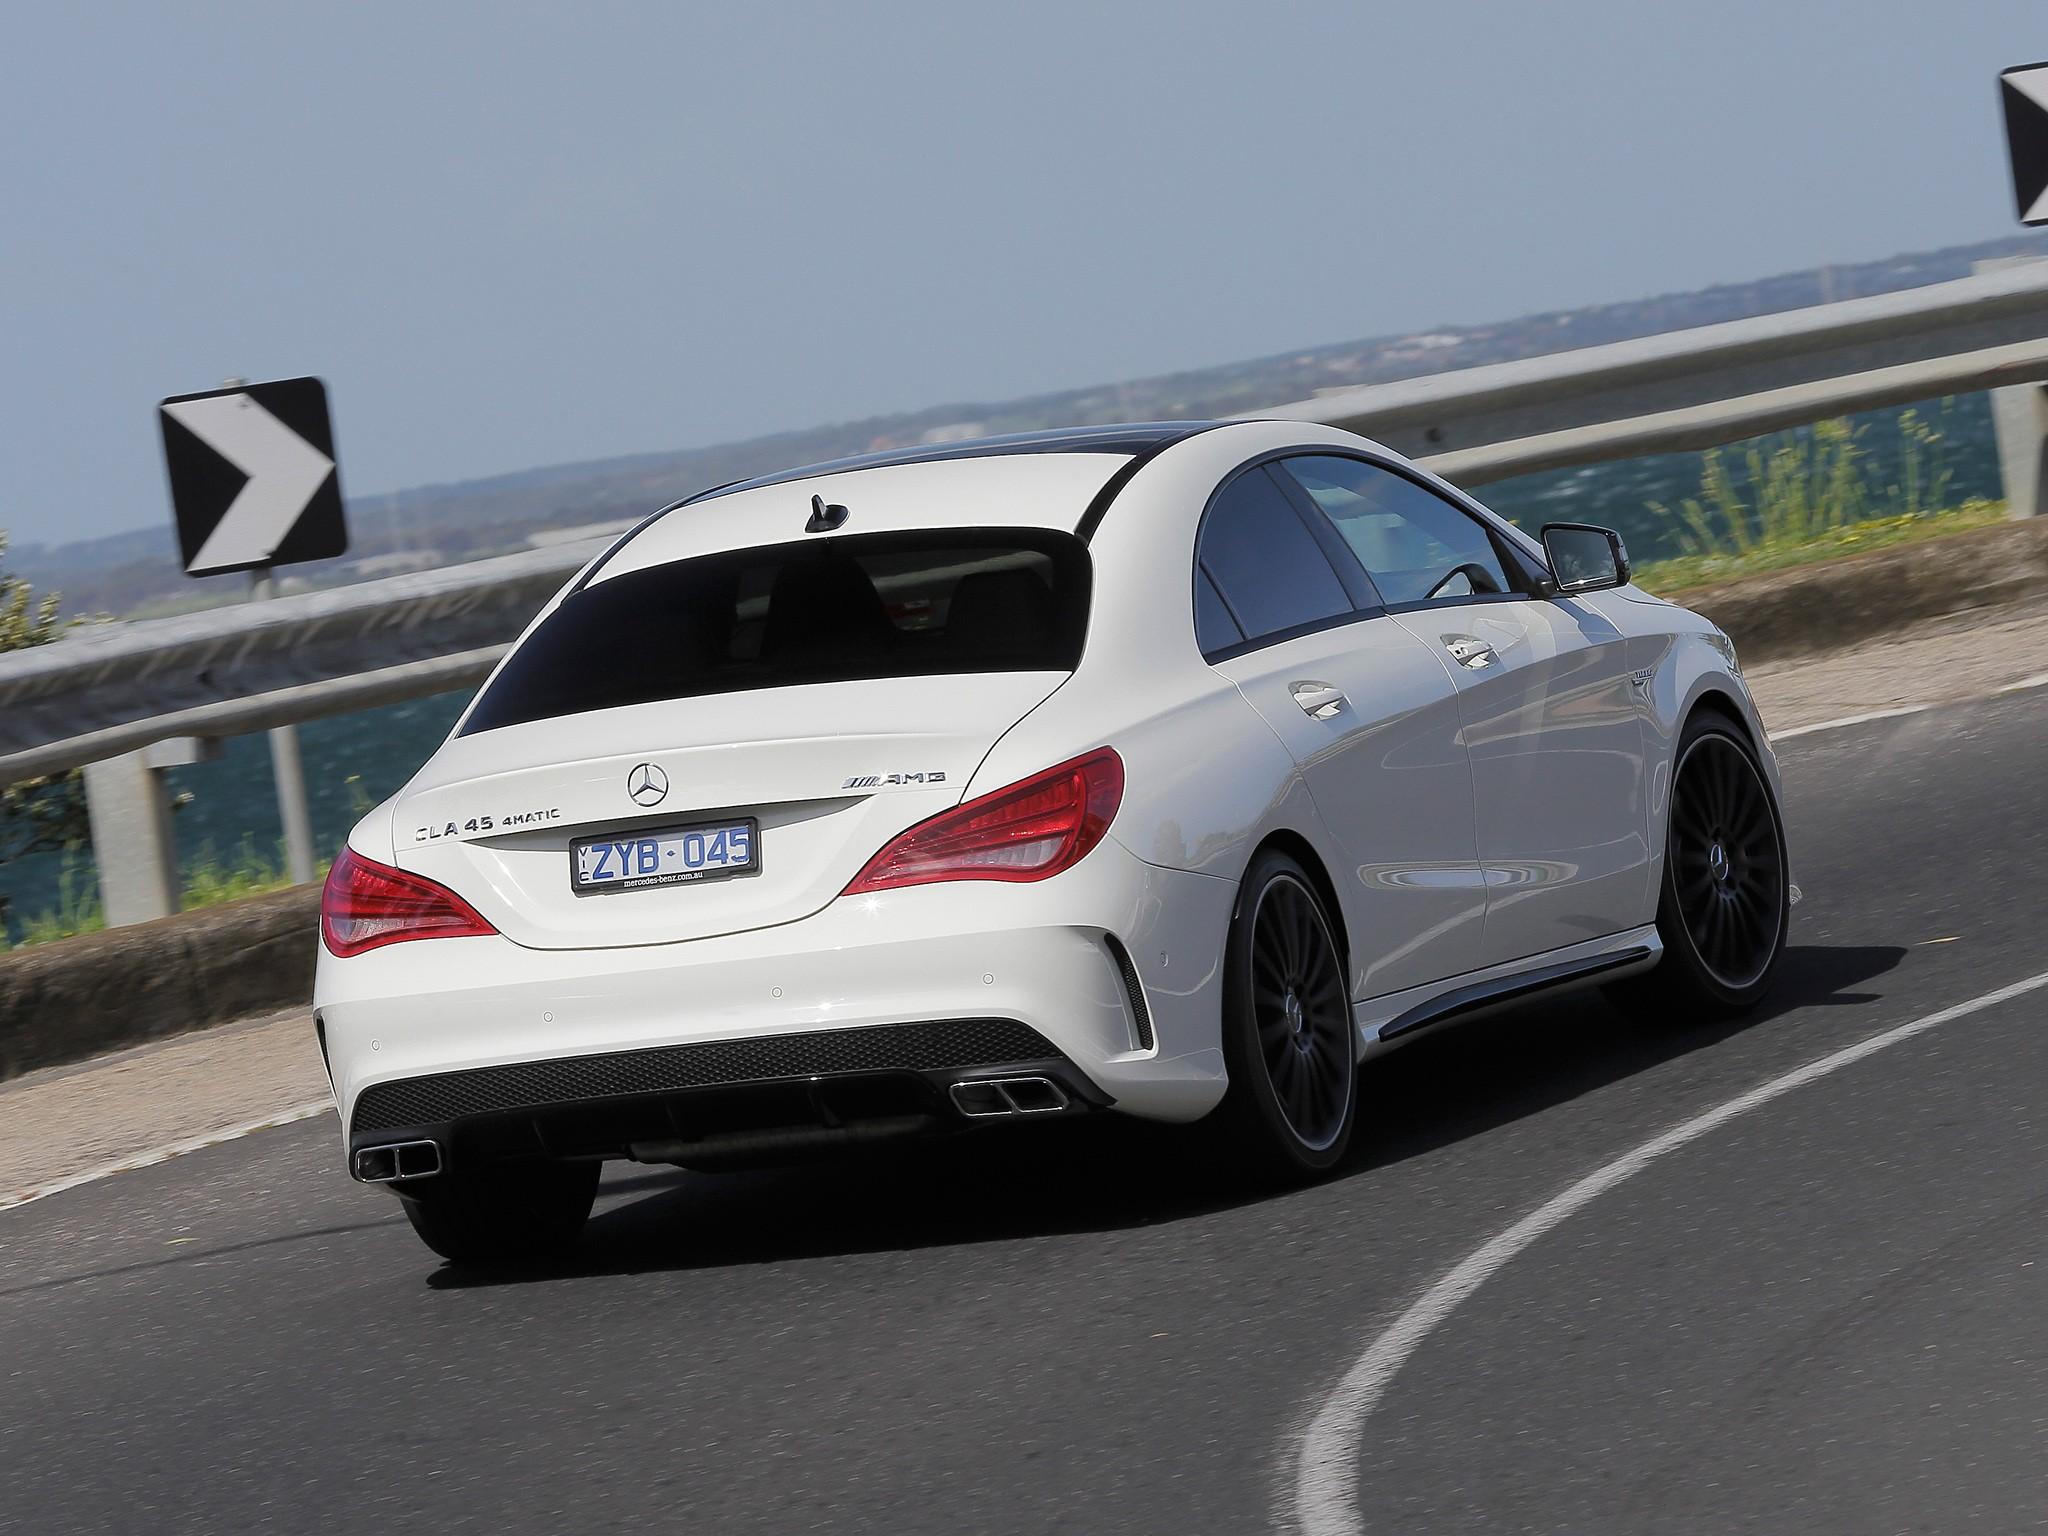 Mercedes benz cla 45 c117 specs 2013 2014 2015 2016 for Mercedes benz cla amg